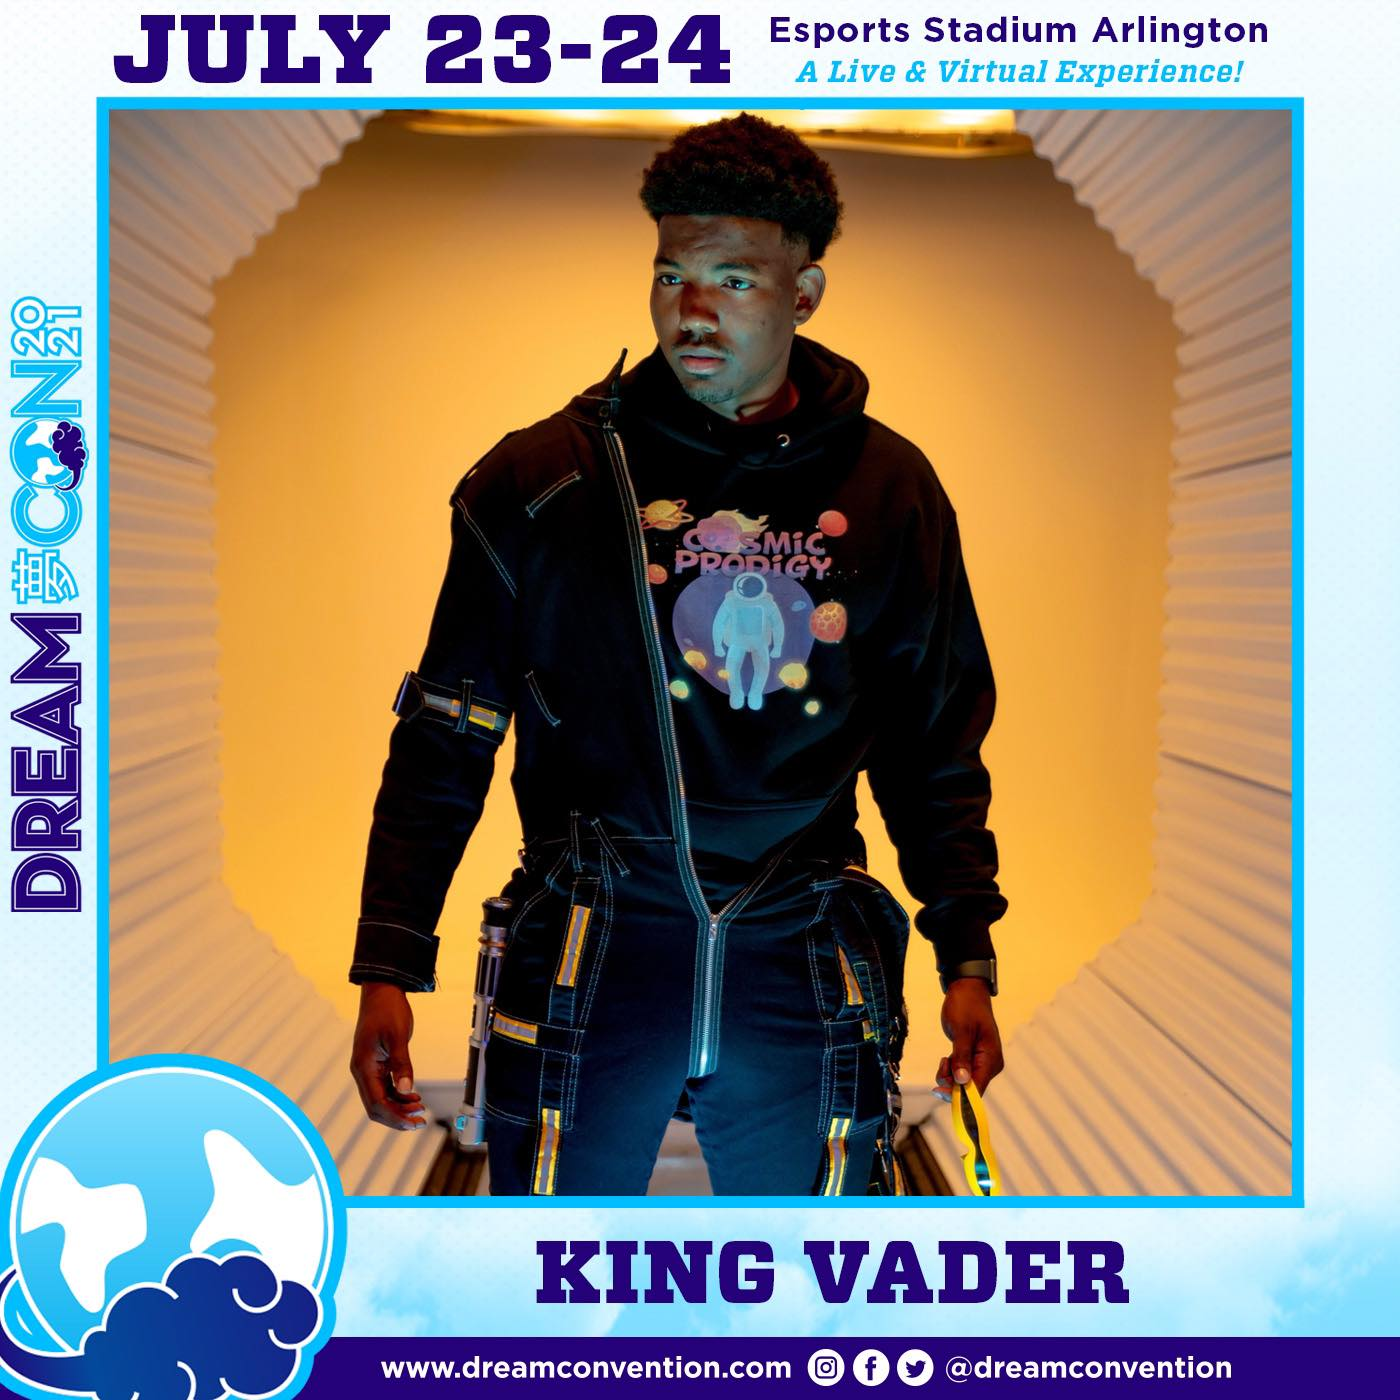 King Vader